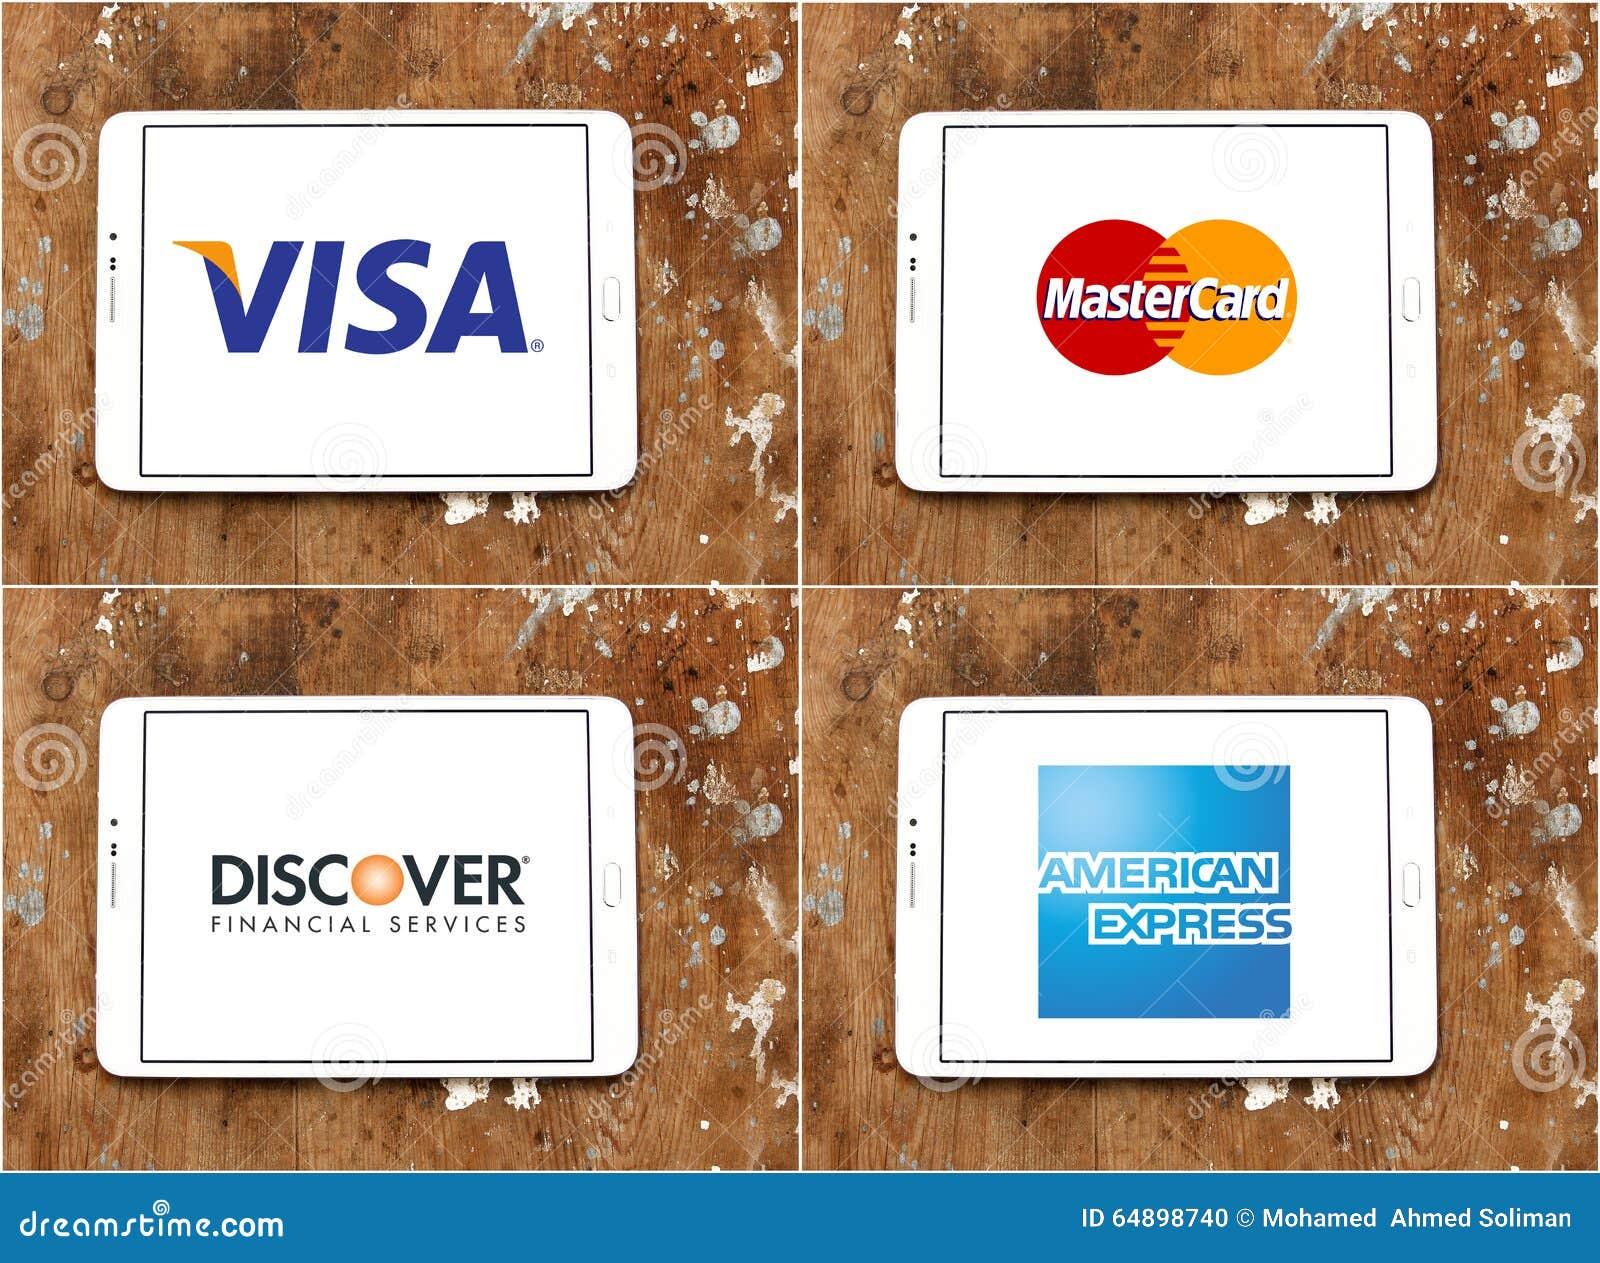 worldwide money transfer methods logos visa mastercard discover